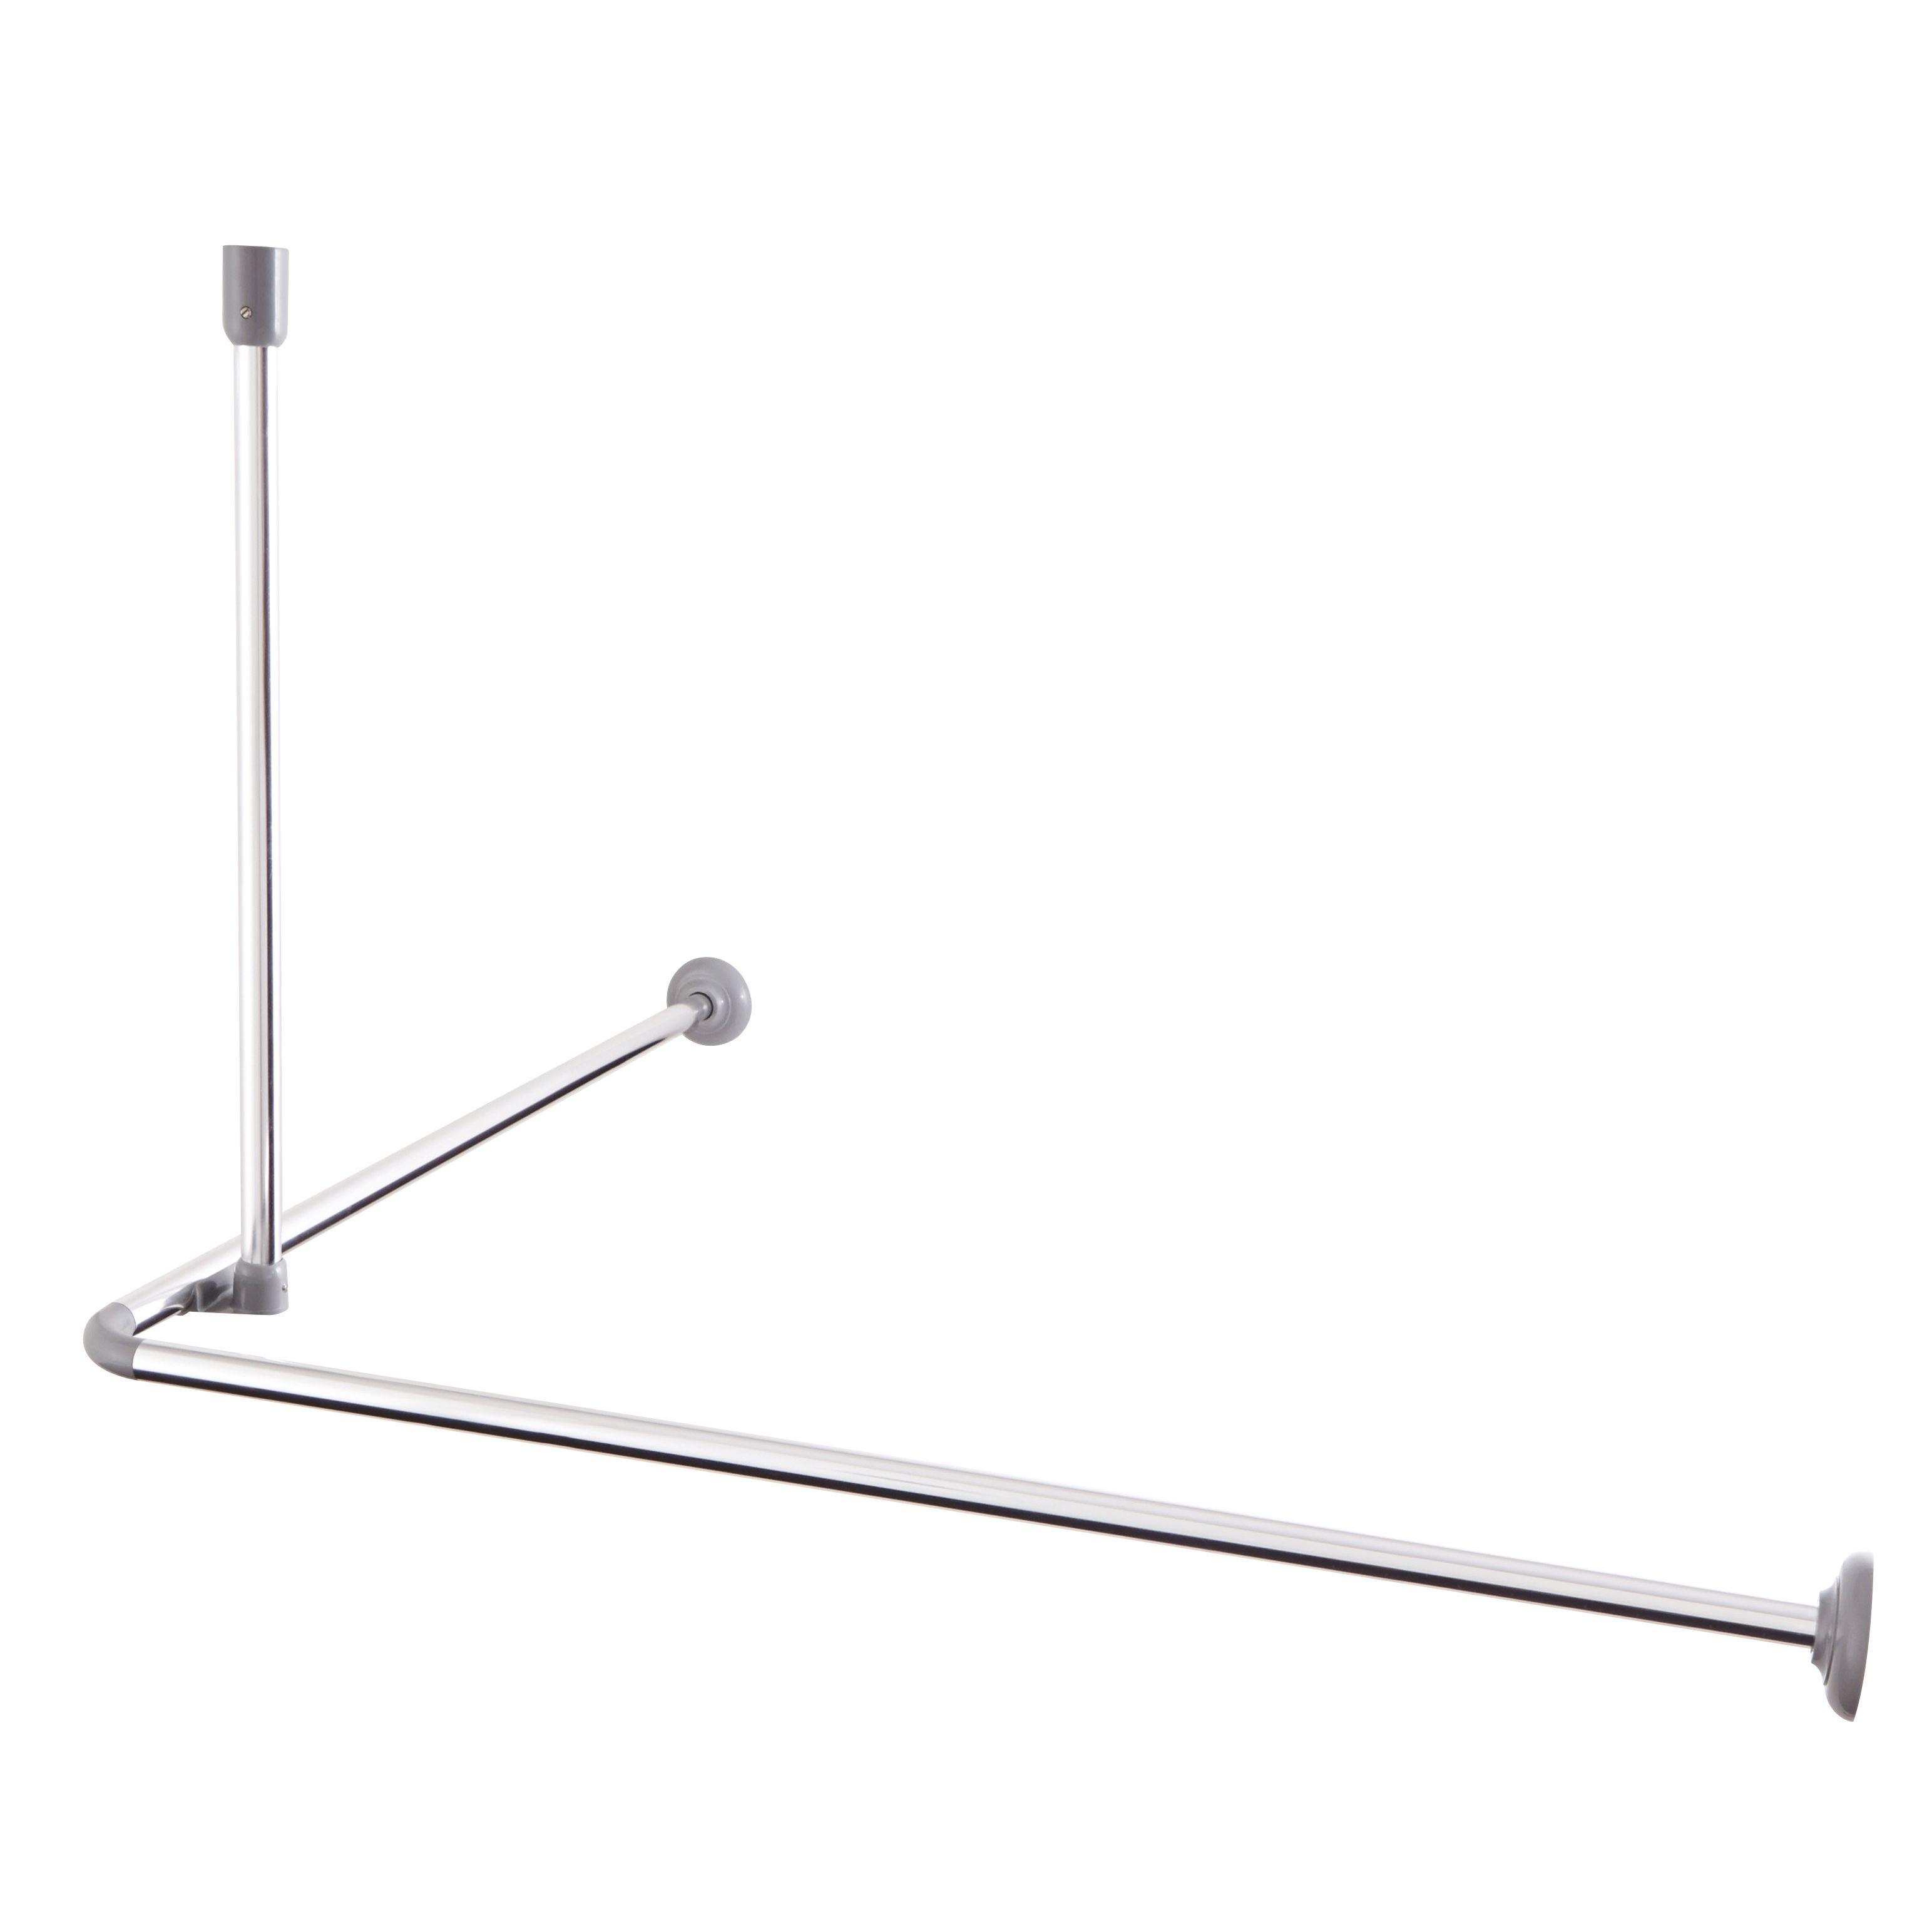 Cooke Lewis Nira Chrome Effect Angled Shower Rod L 0 8m Departments Diy At B Q